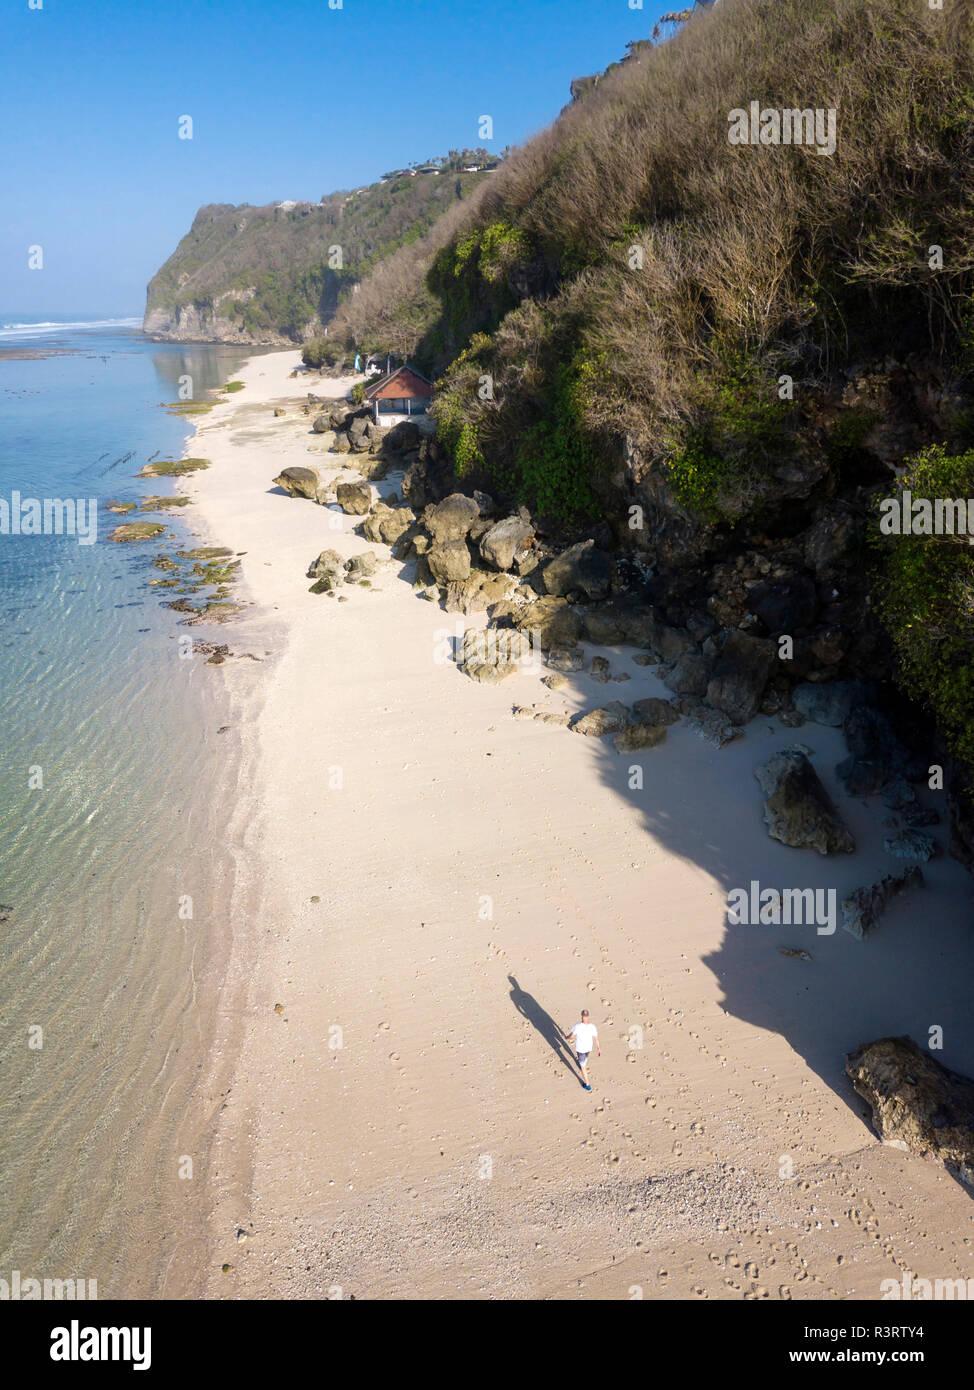 Indonesia, Bali, vista aérea del Karma Kandara playa, hombre que camina en la playa Foto de stock